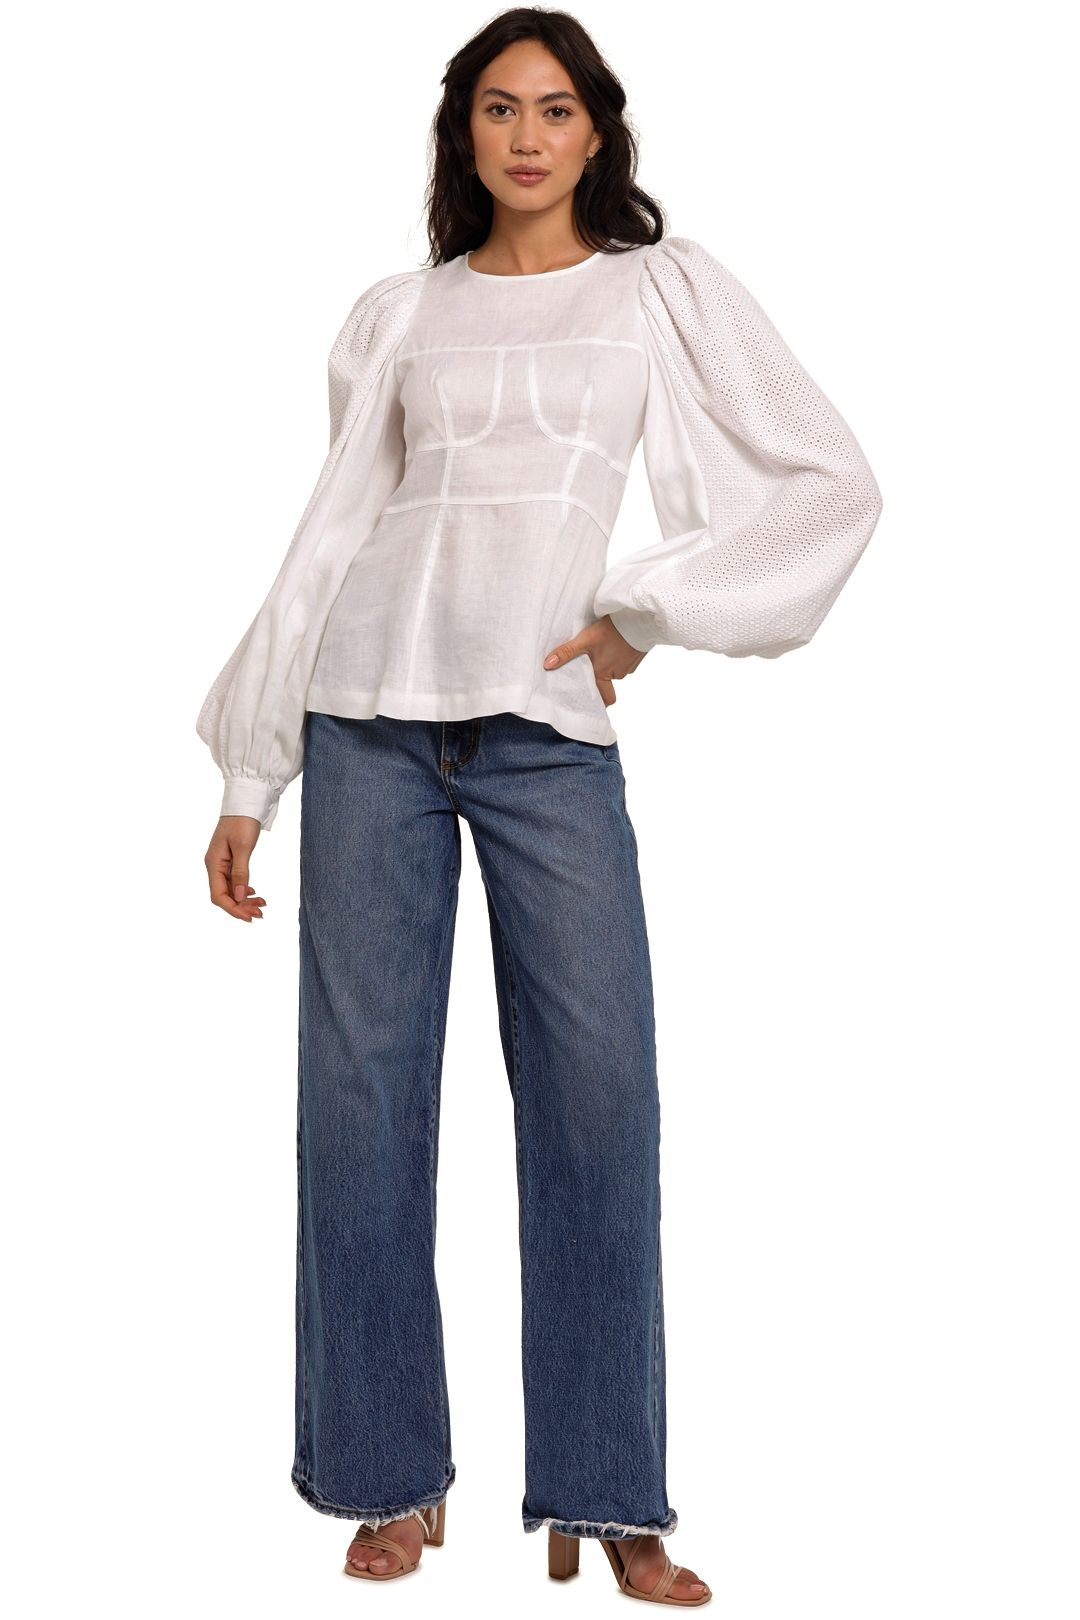 Joslin Reagan Linen Crochet Top White